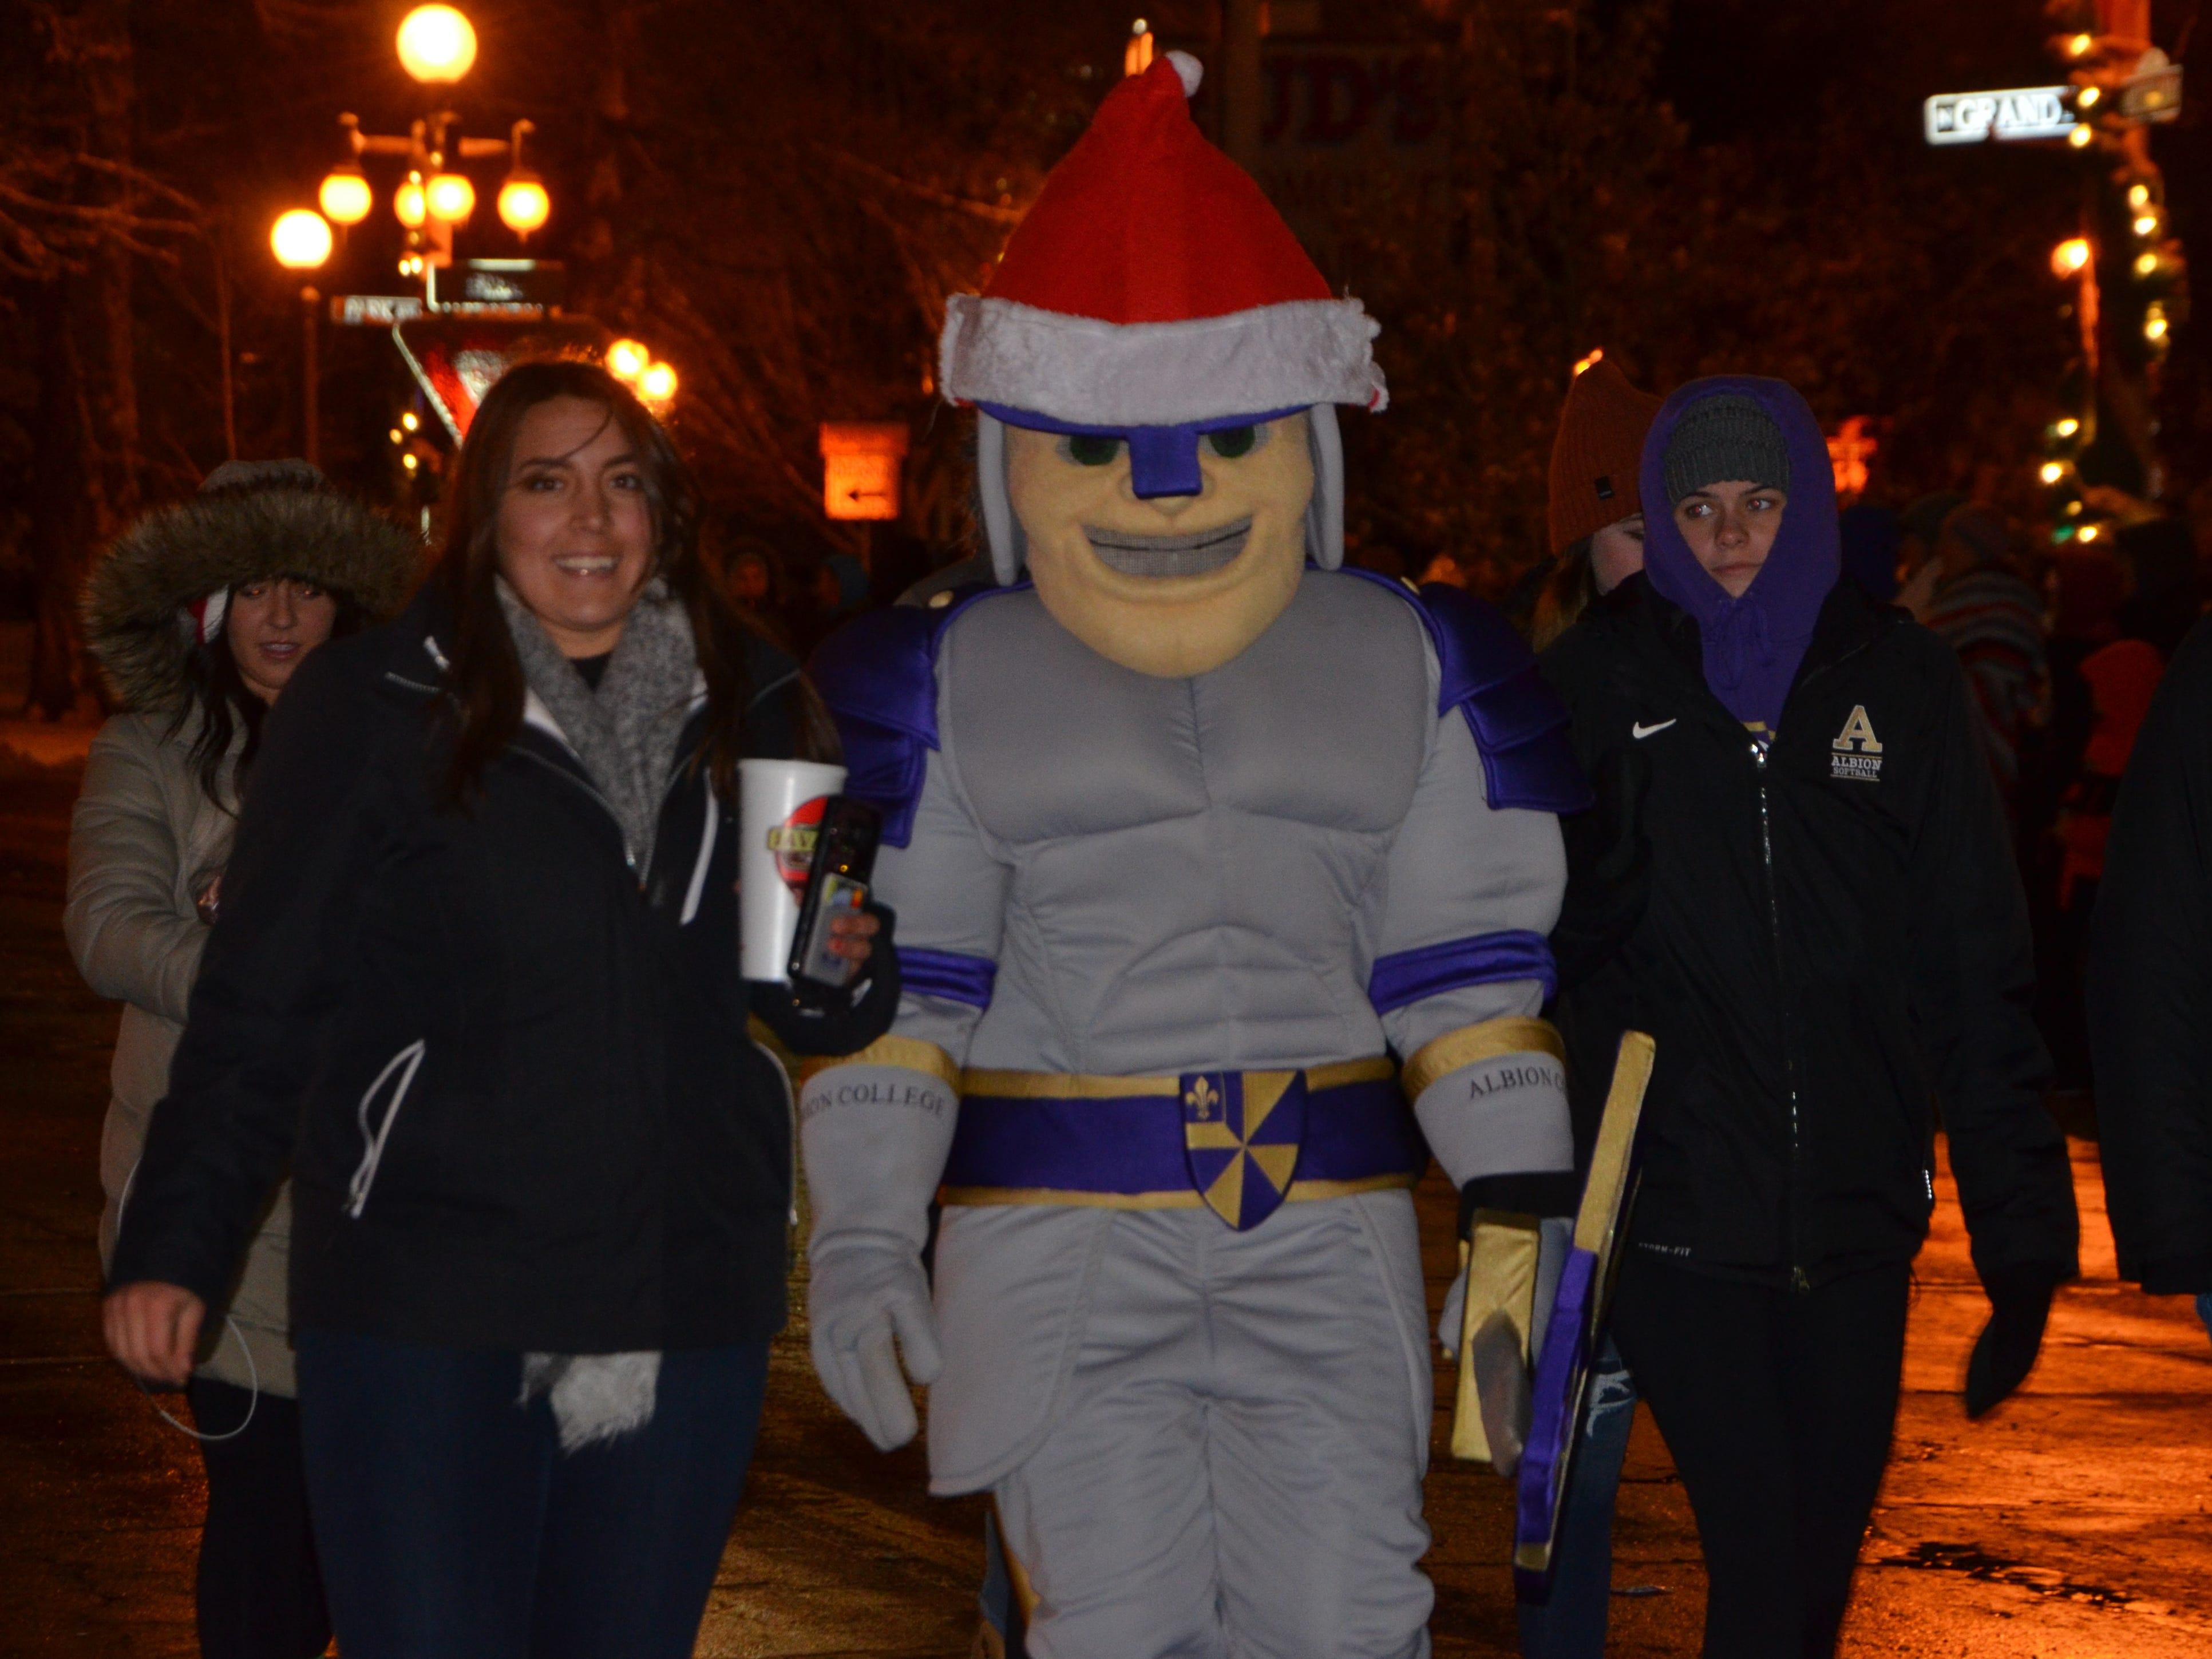 54th Marshall Christmas Parade, November 26, 2018.